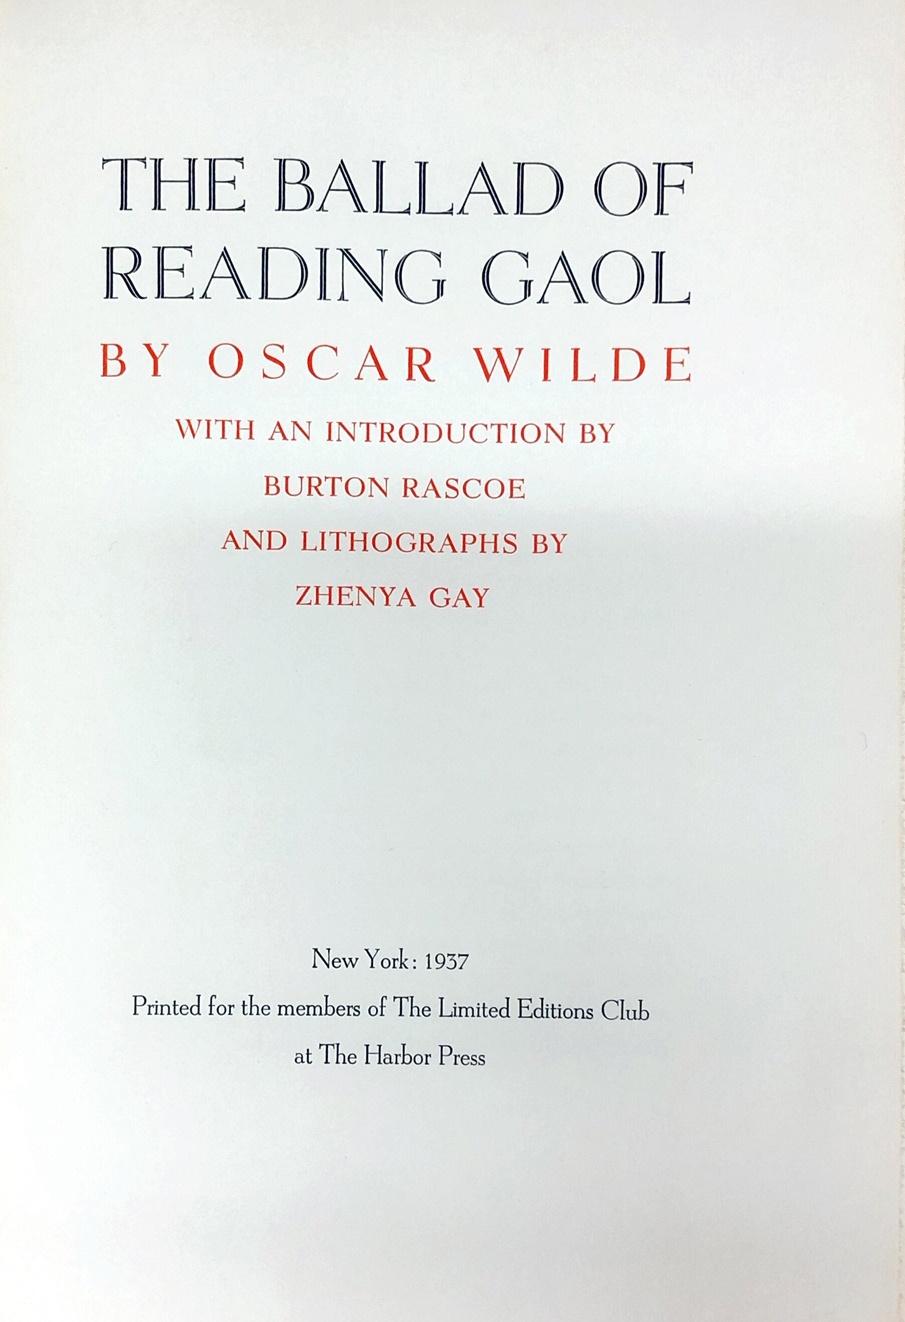 Lot 52 - Limited Editions Club Publications Wilde (Oscar) The Ballad of Reading Gaol, illus.